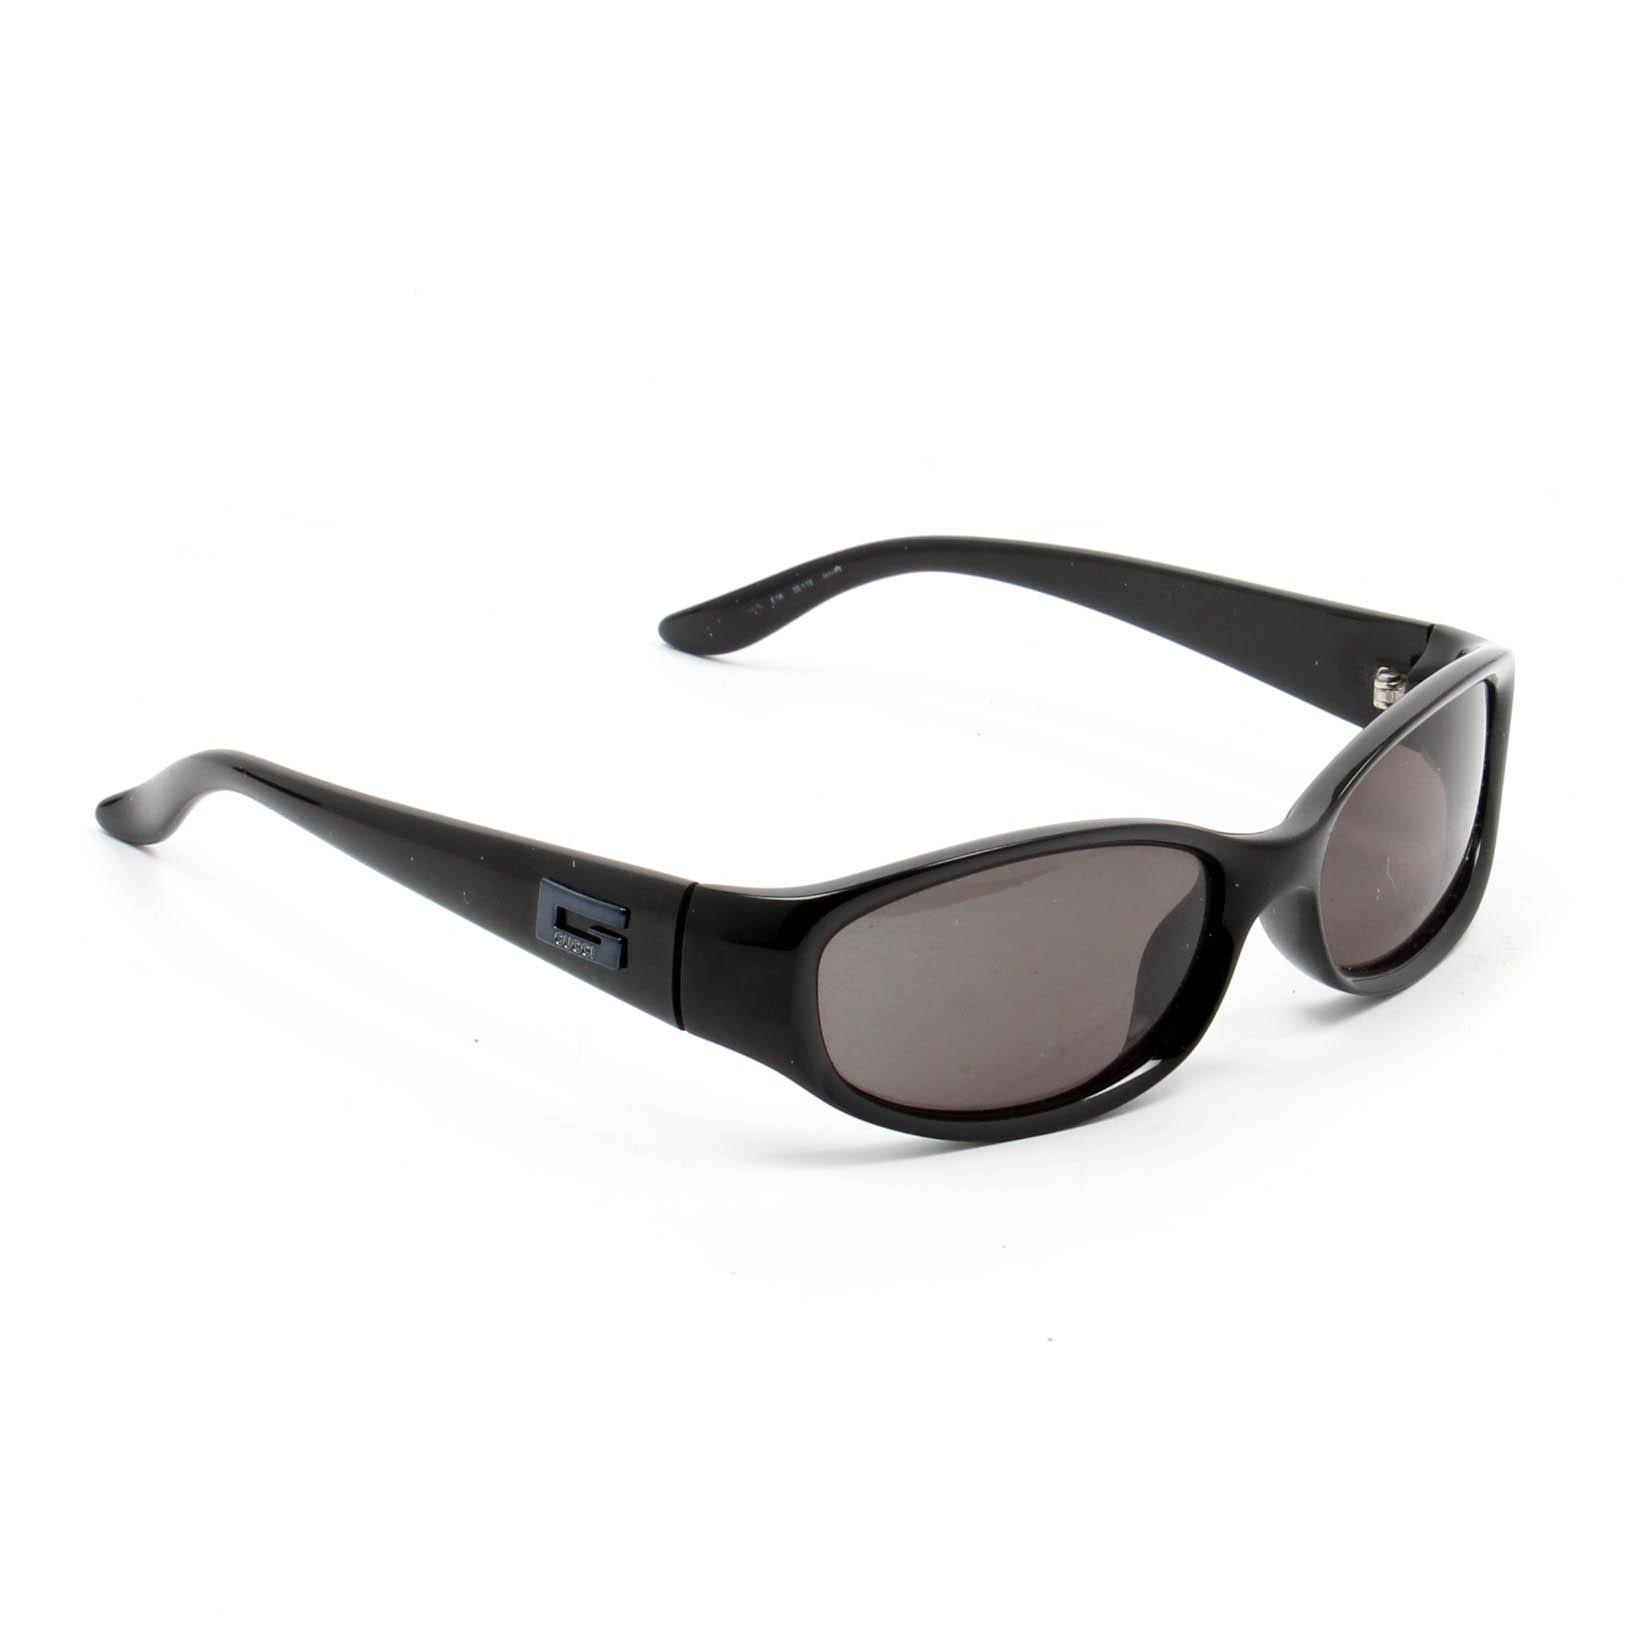 Gucci Black Acetate Sunglasses